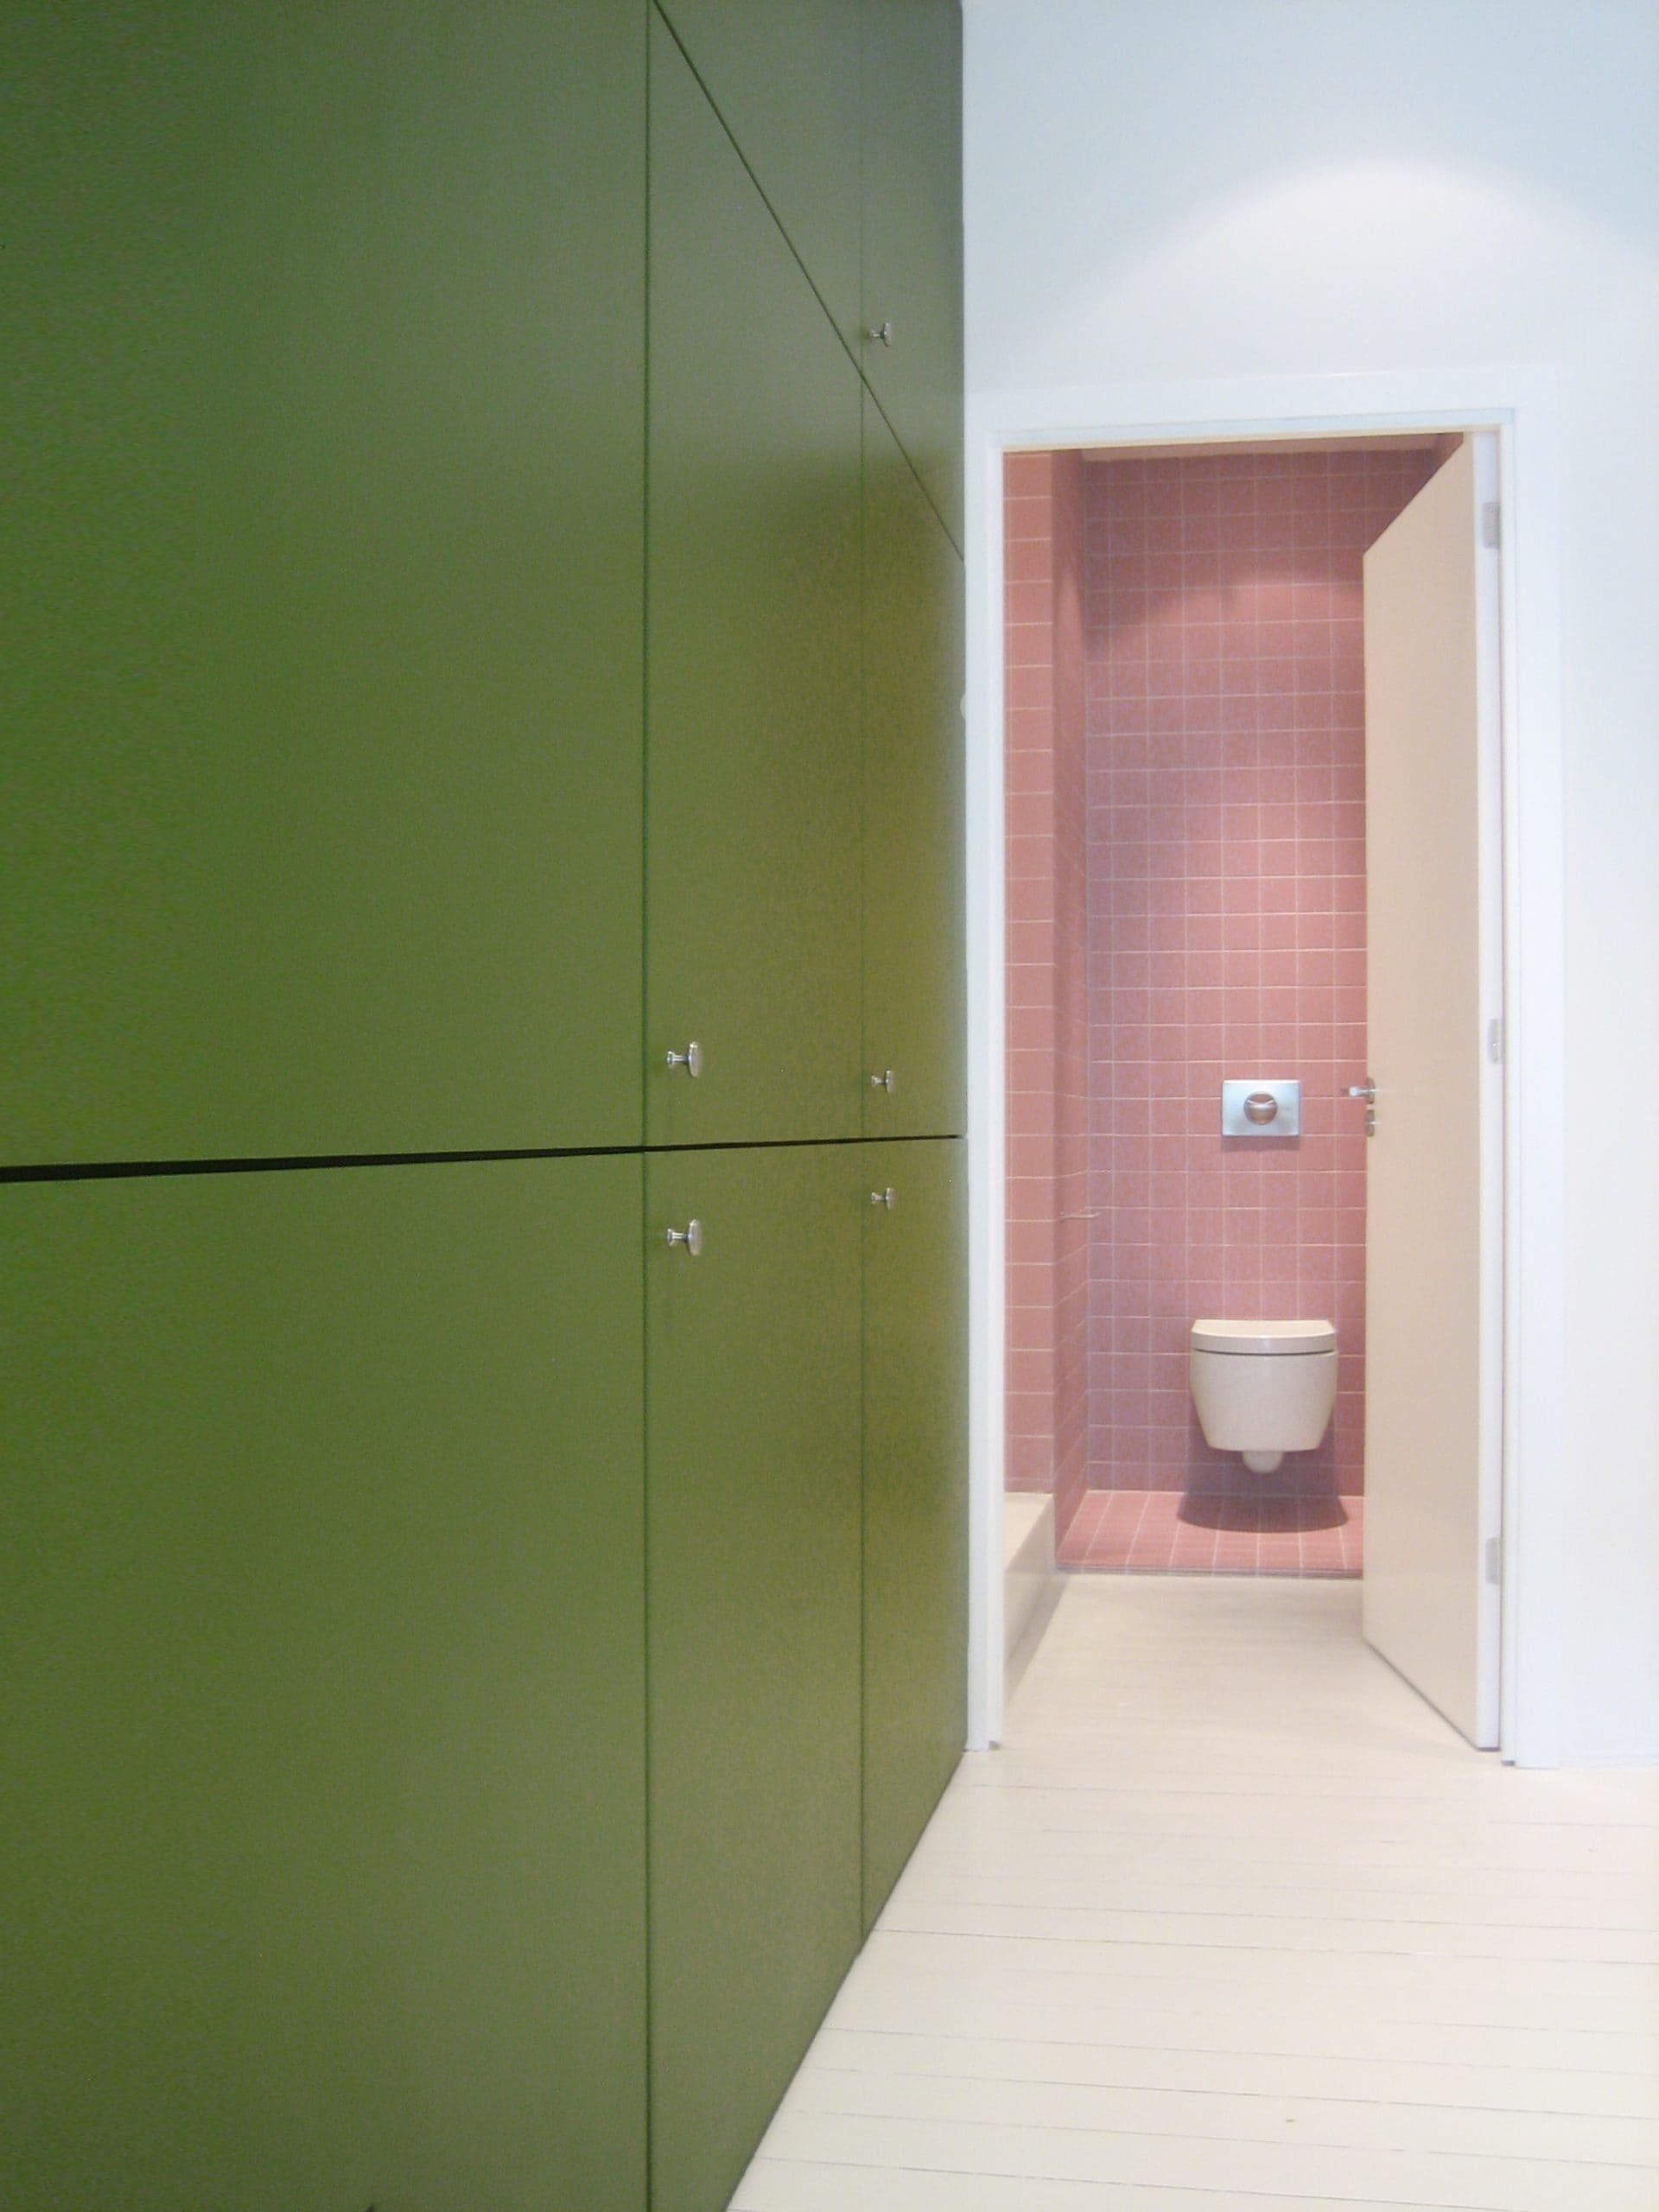 groene inbouwkast linnenkast appartement